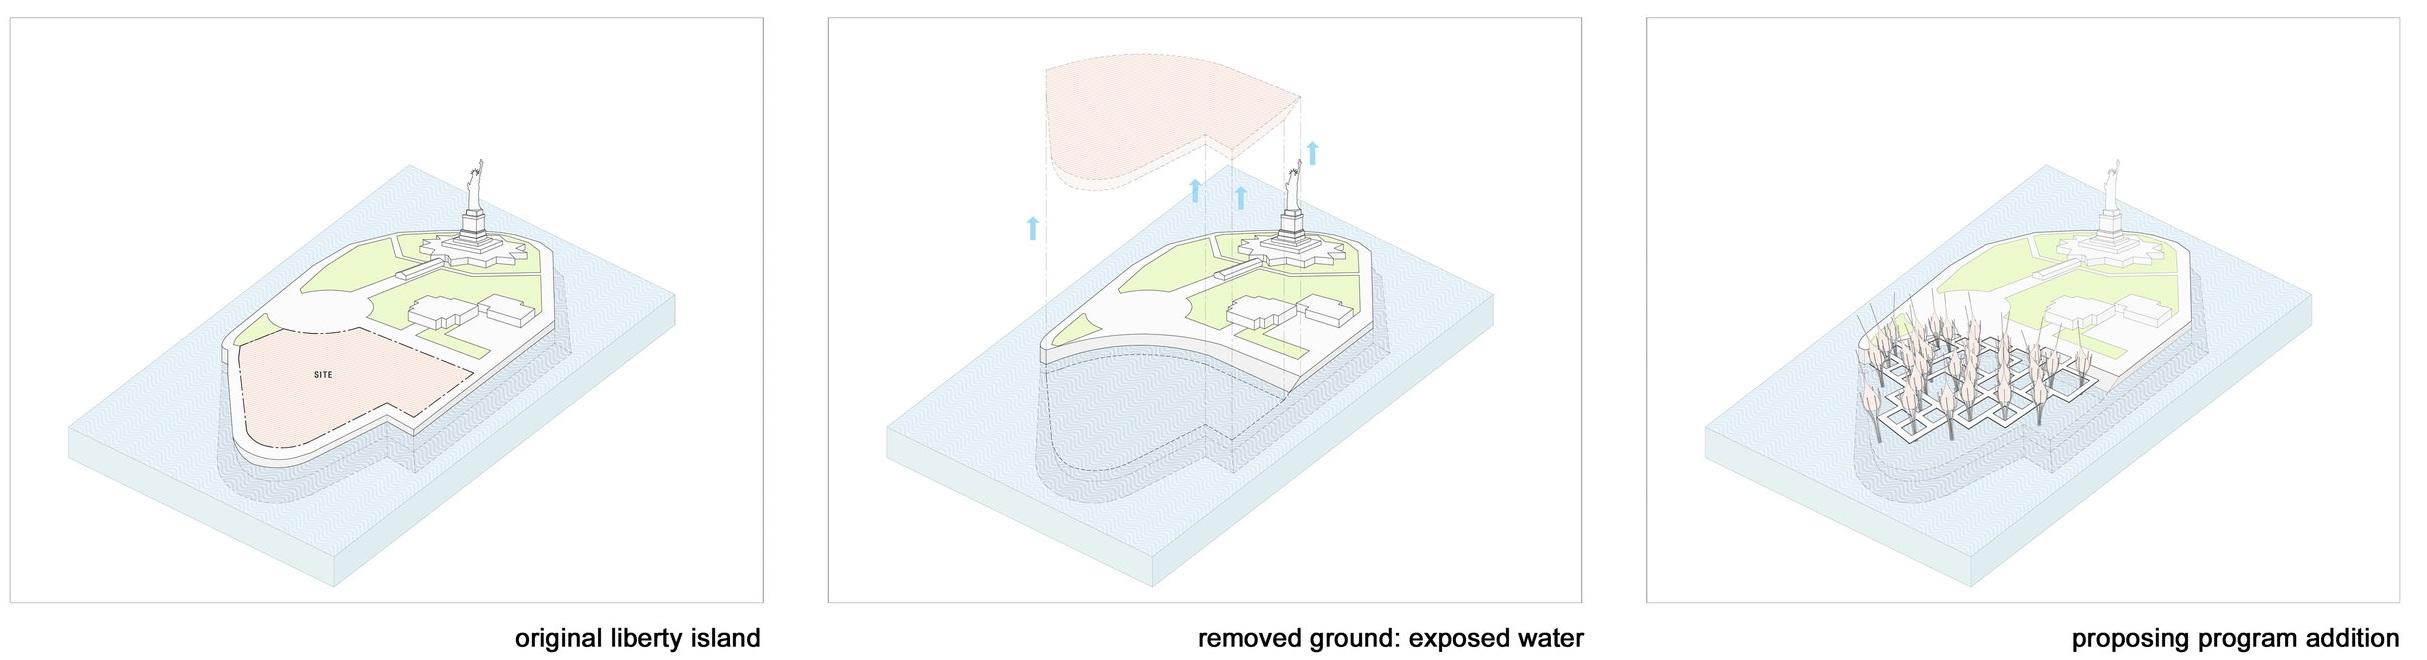 diagram02.jpg